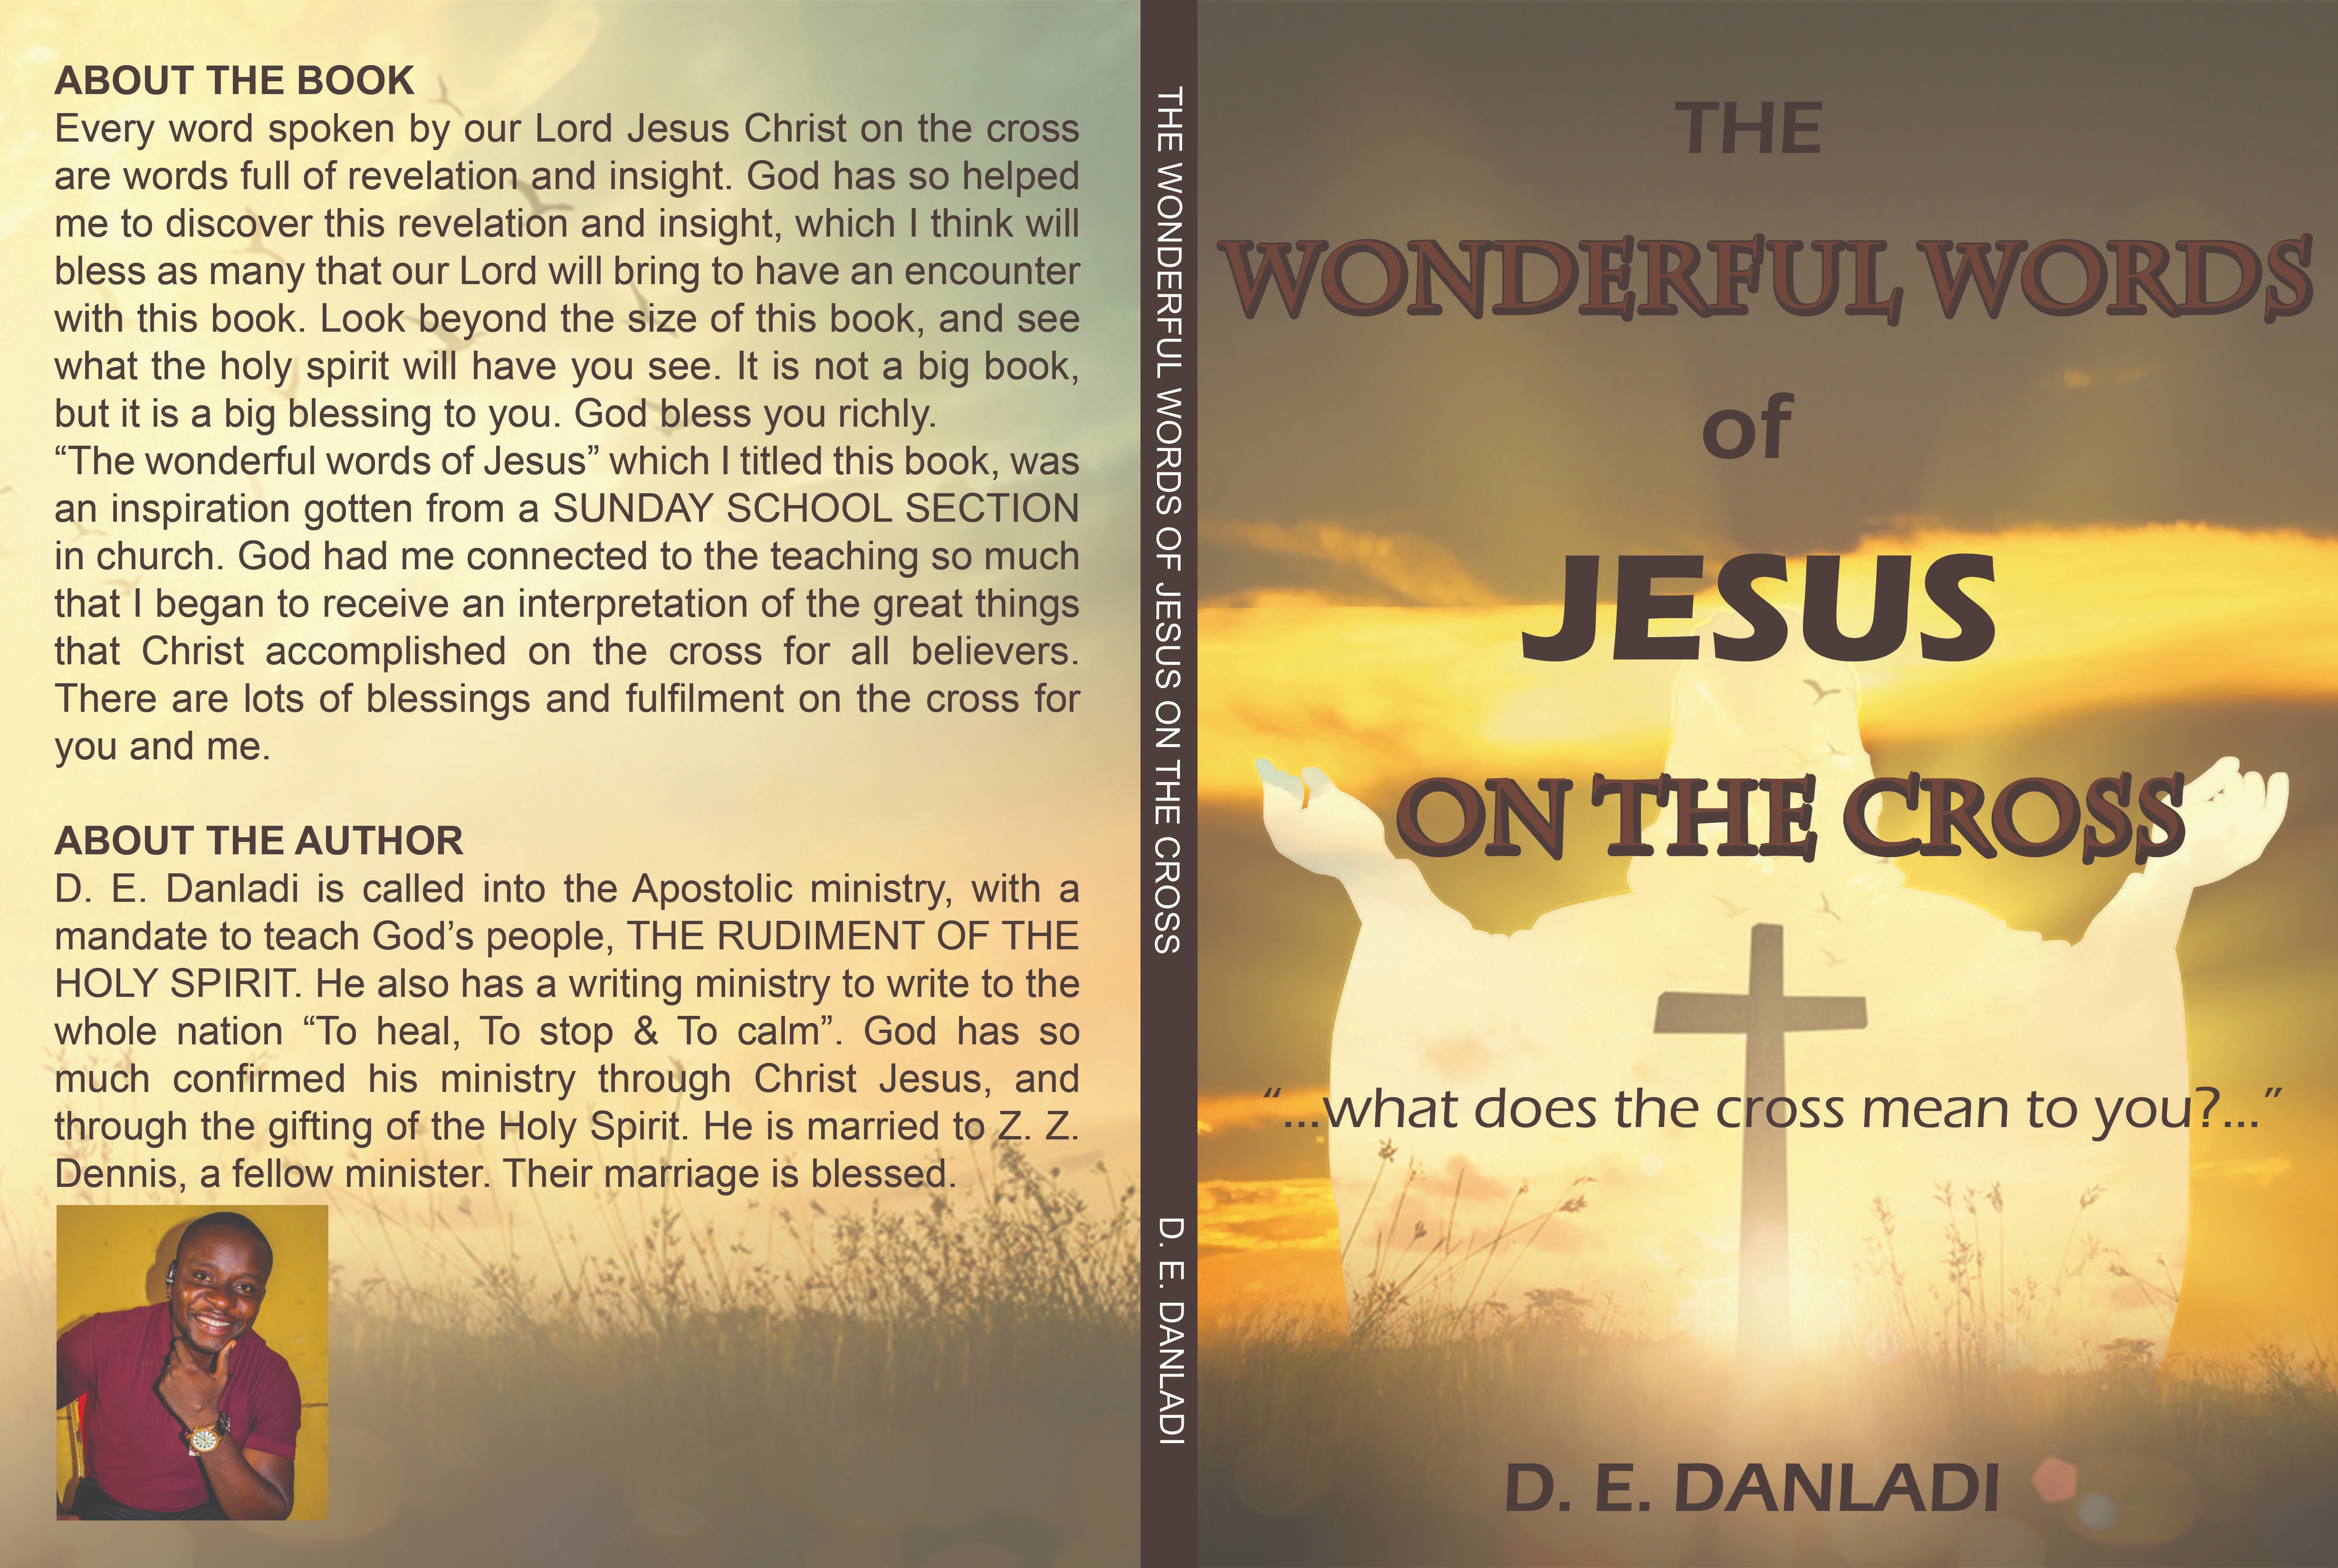 THE WONDERFUL WORDS OF JESUS ON THE CROSS